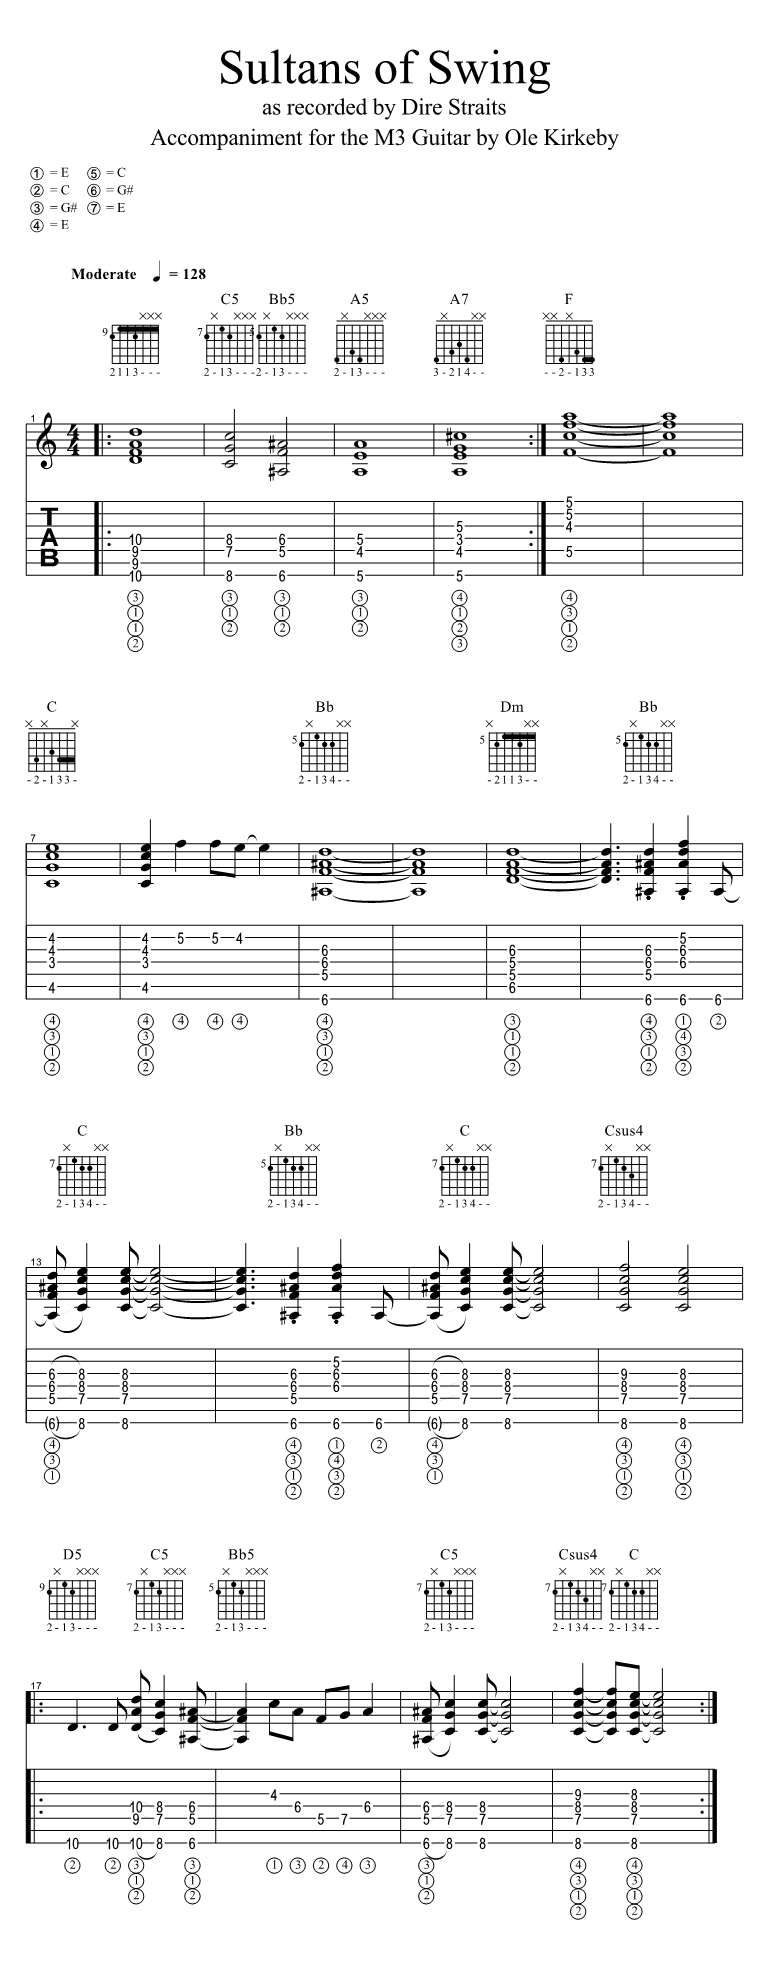 M3 Guitar 2 0 Accompaniment Strumming